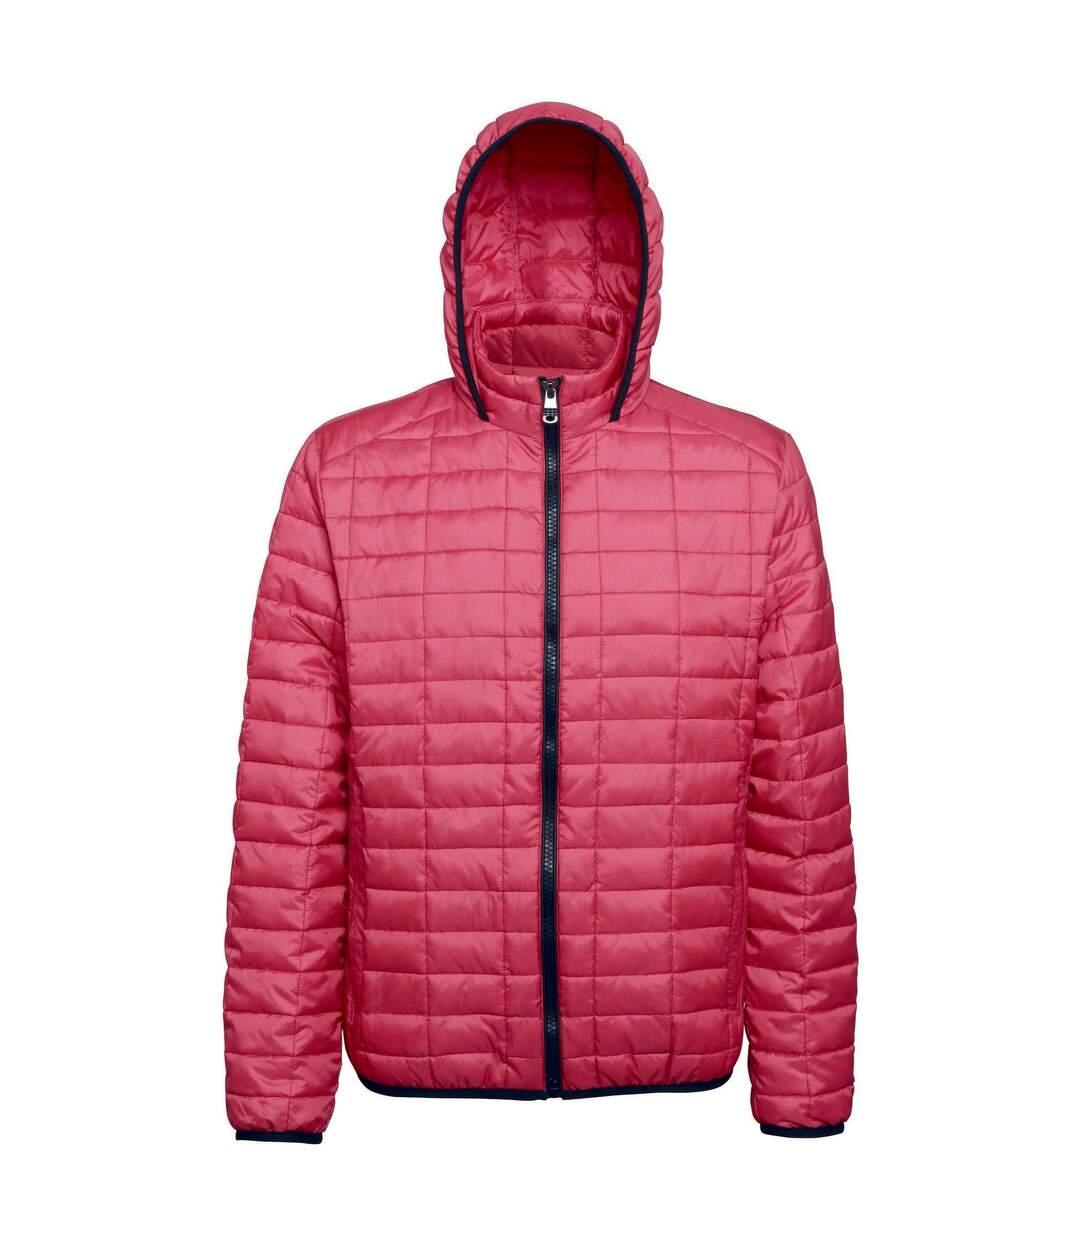 2786 Mens Honeycomb Padded Hooded Jacket (Red) - UTRW5018